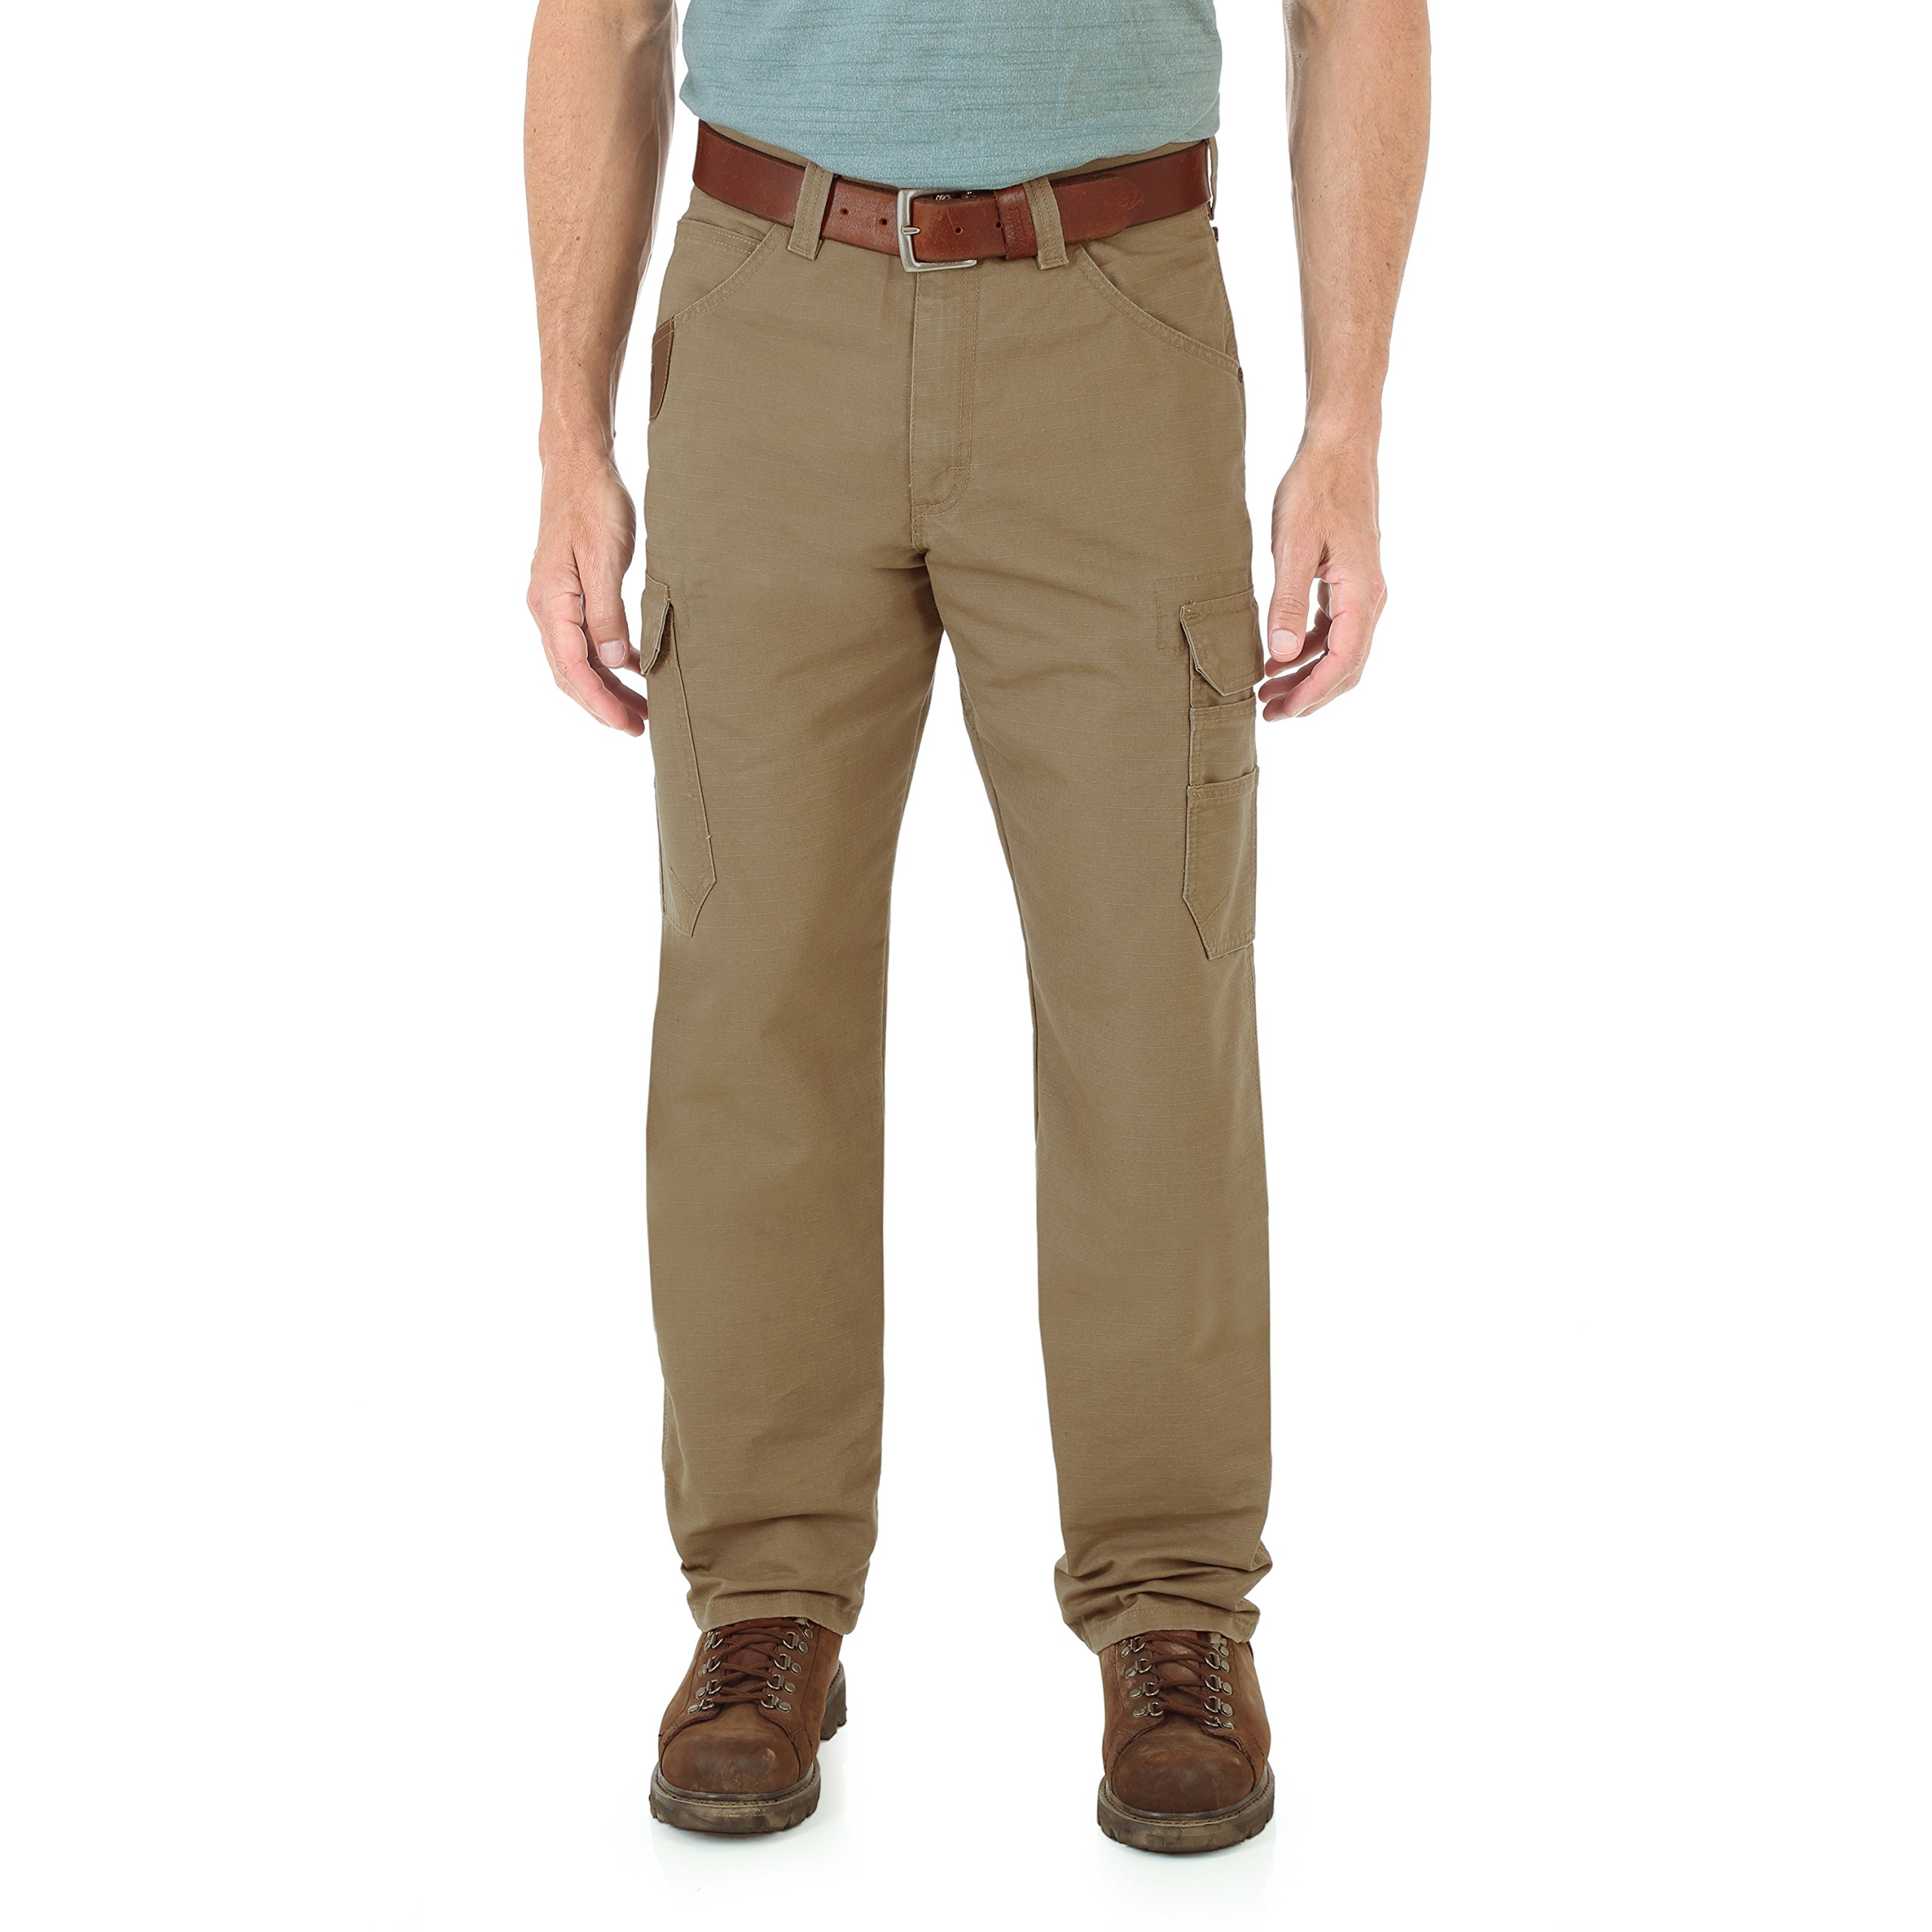 Wrangler Men's Riggs Workwear Cool Vantage Ripstop Cargo, Rawhide, 33x34